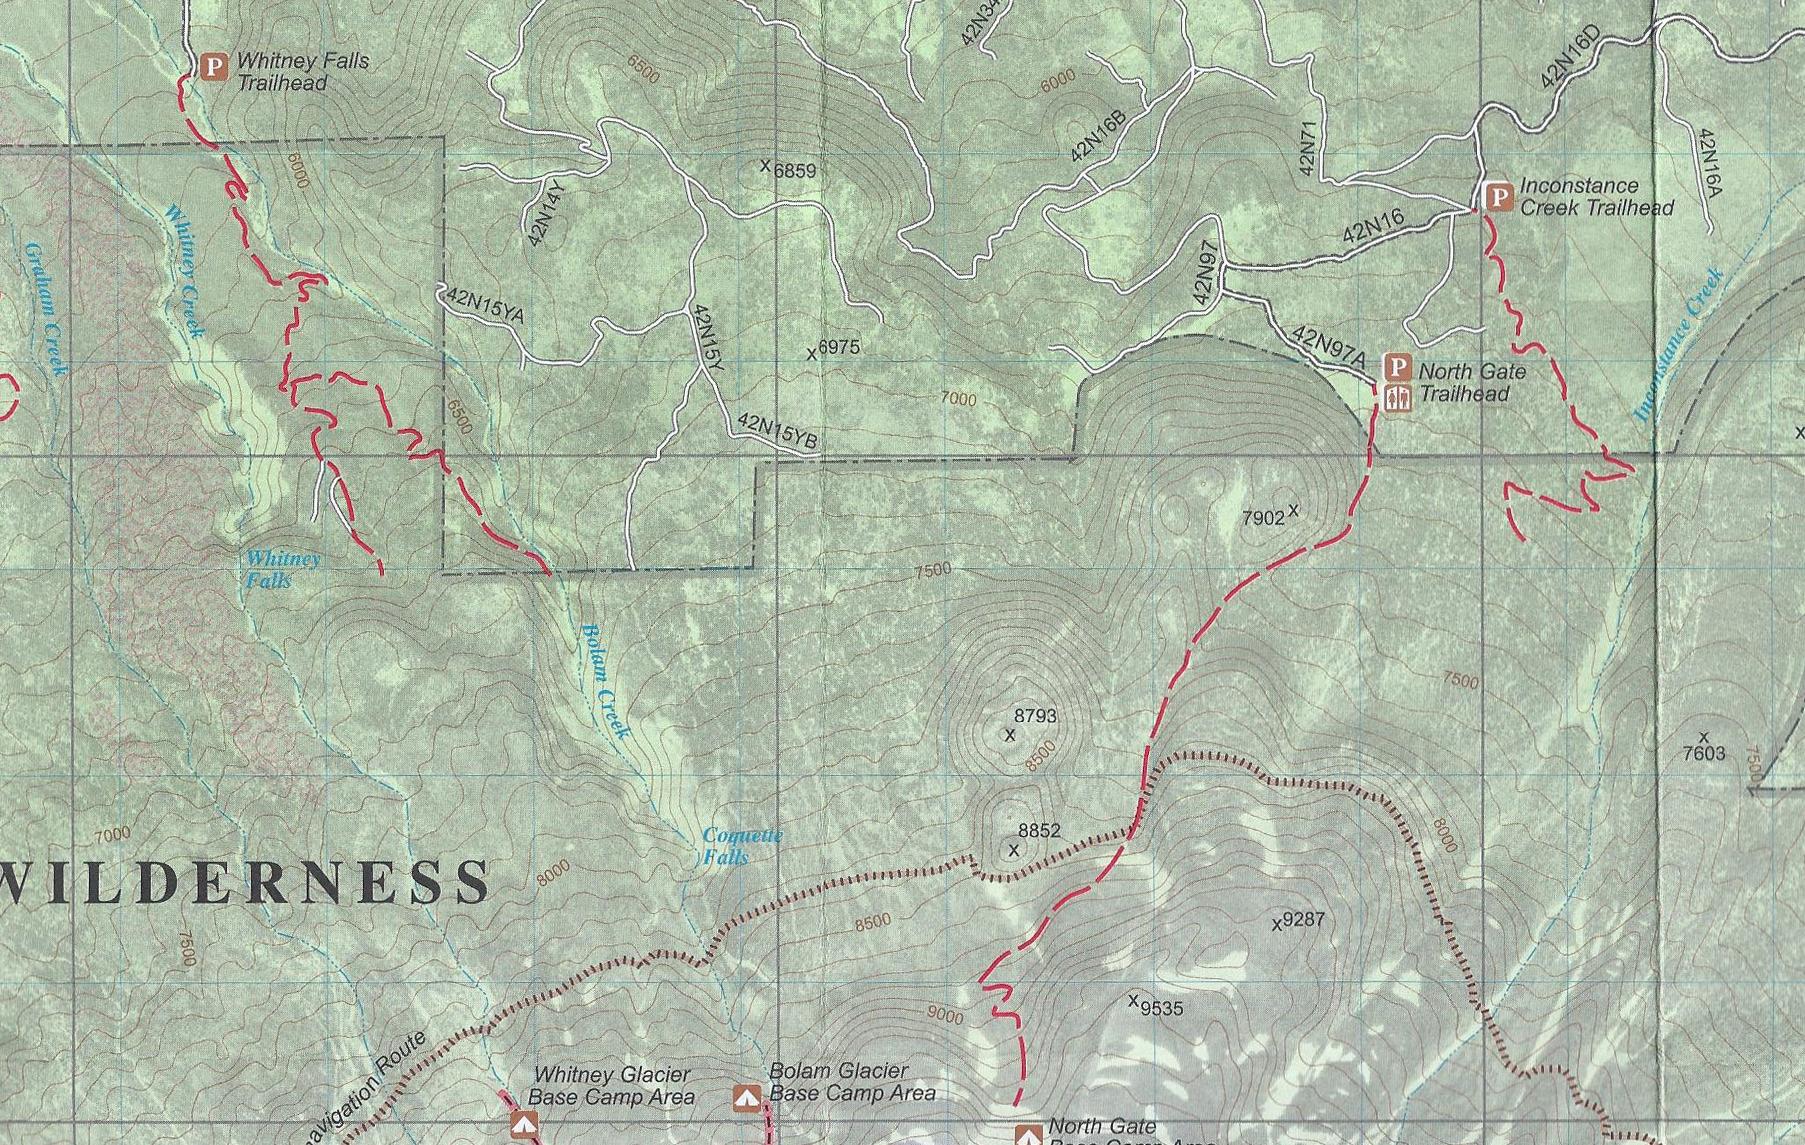 Review: Three Mount Shasta Trail Maps | Hike Mt. Shasta